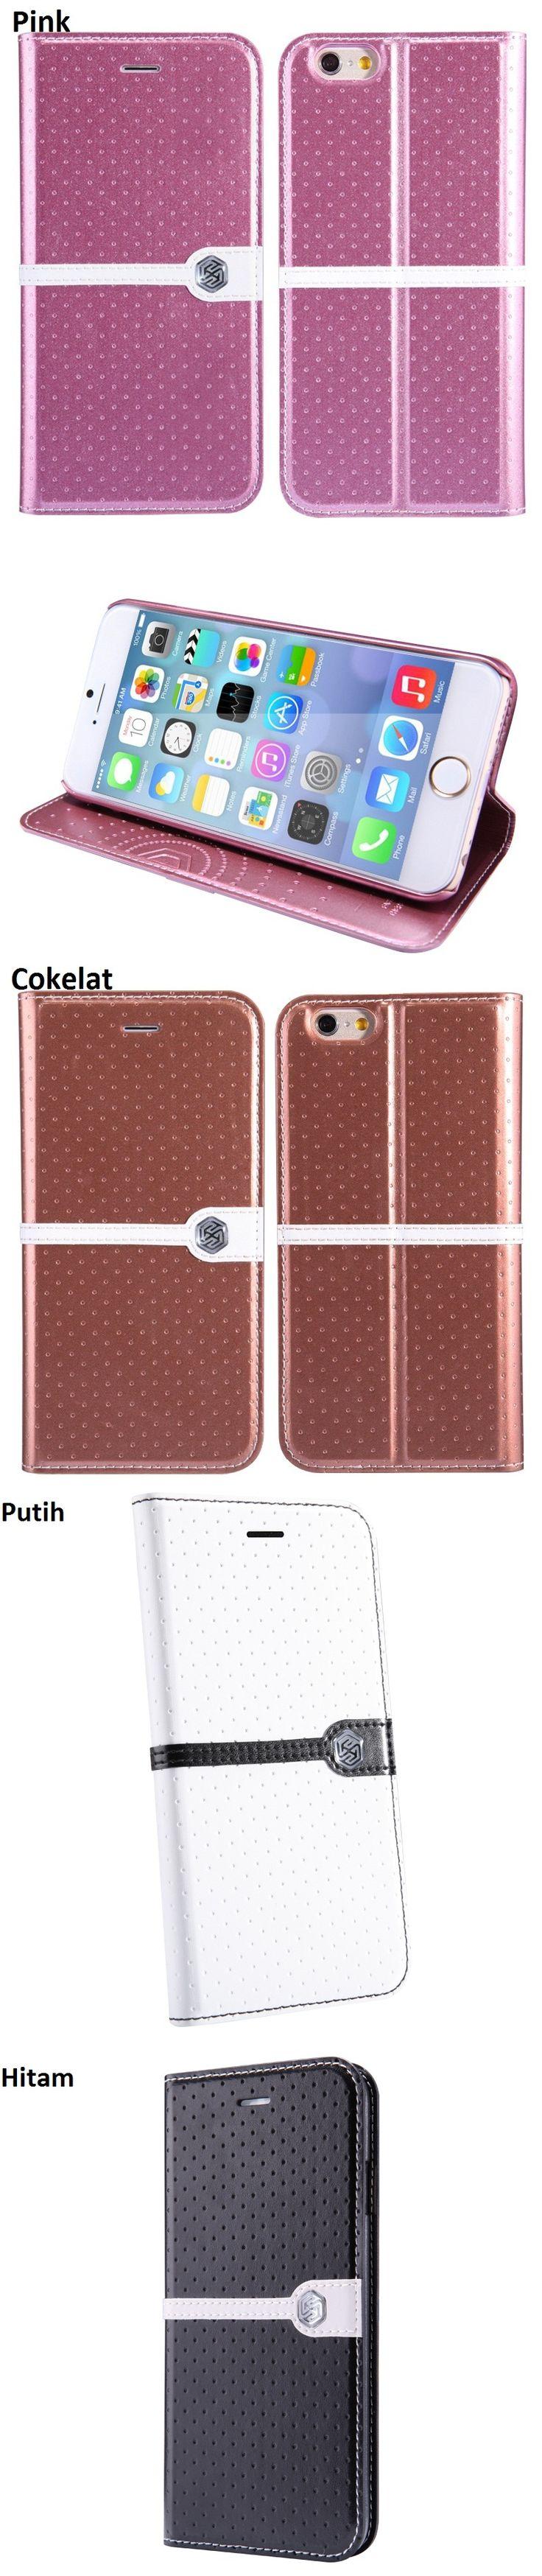 Nillkin Ice Leather Case iPhone 6  ---  kitkes.com/product/197/881/Nillkin-Ice-Leather-Case-iPhone-6/?o=default